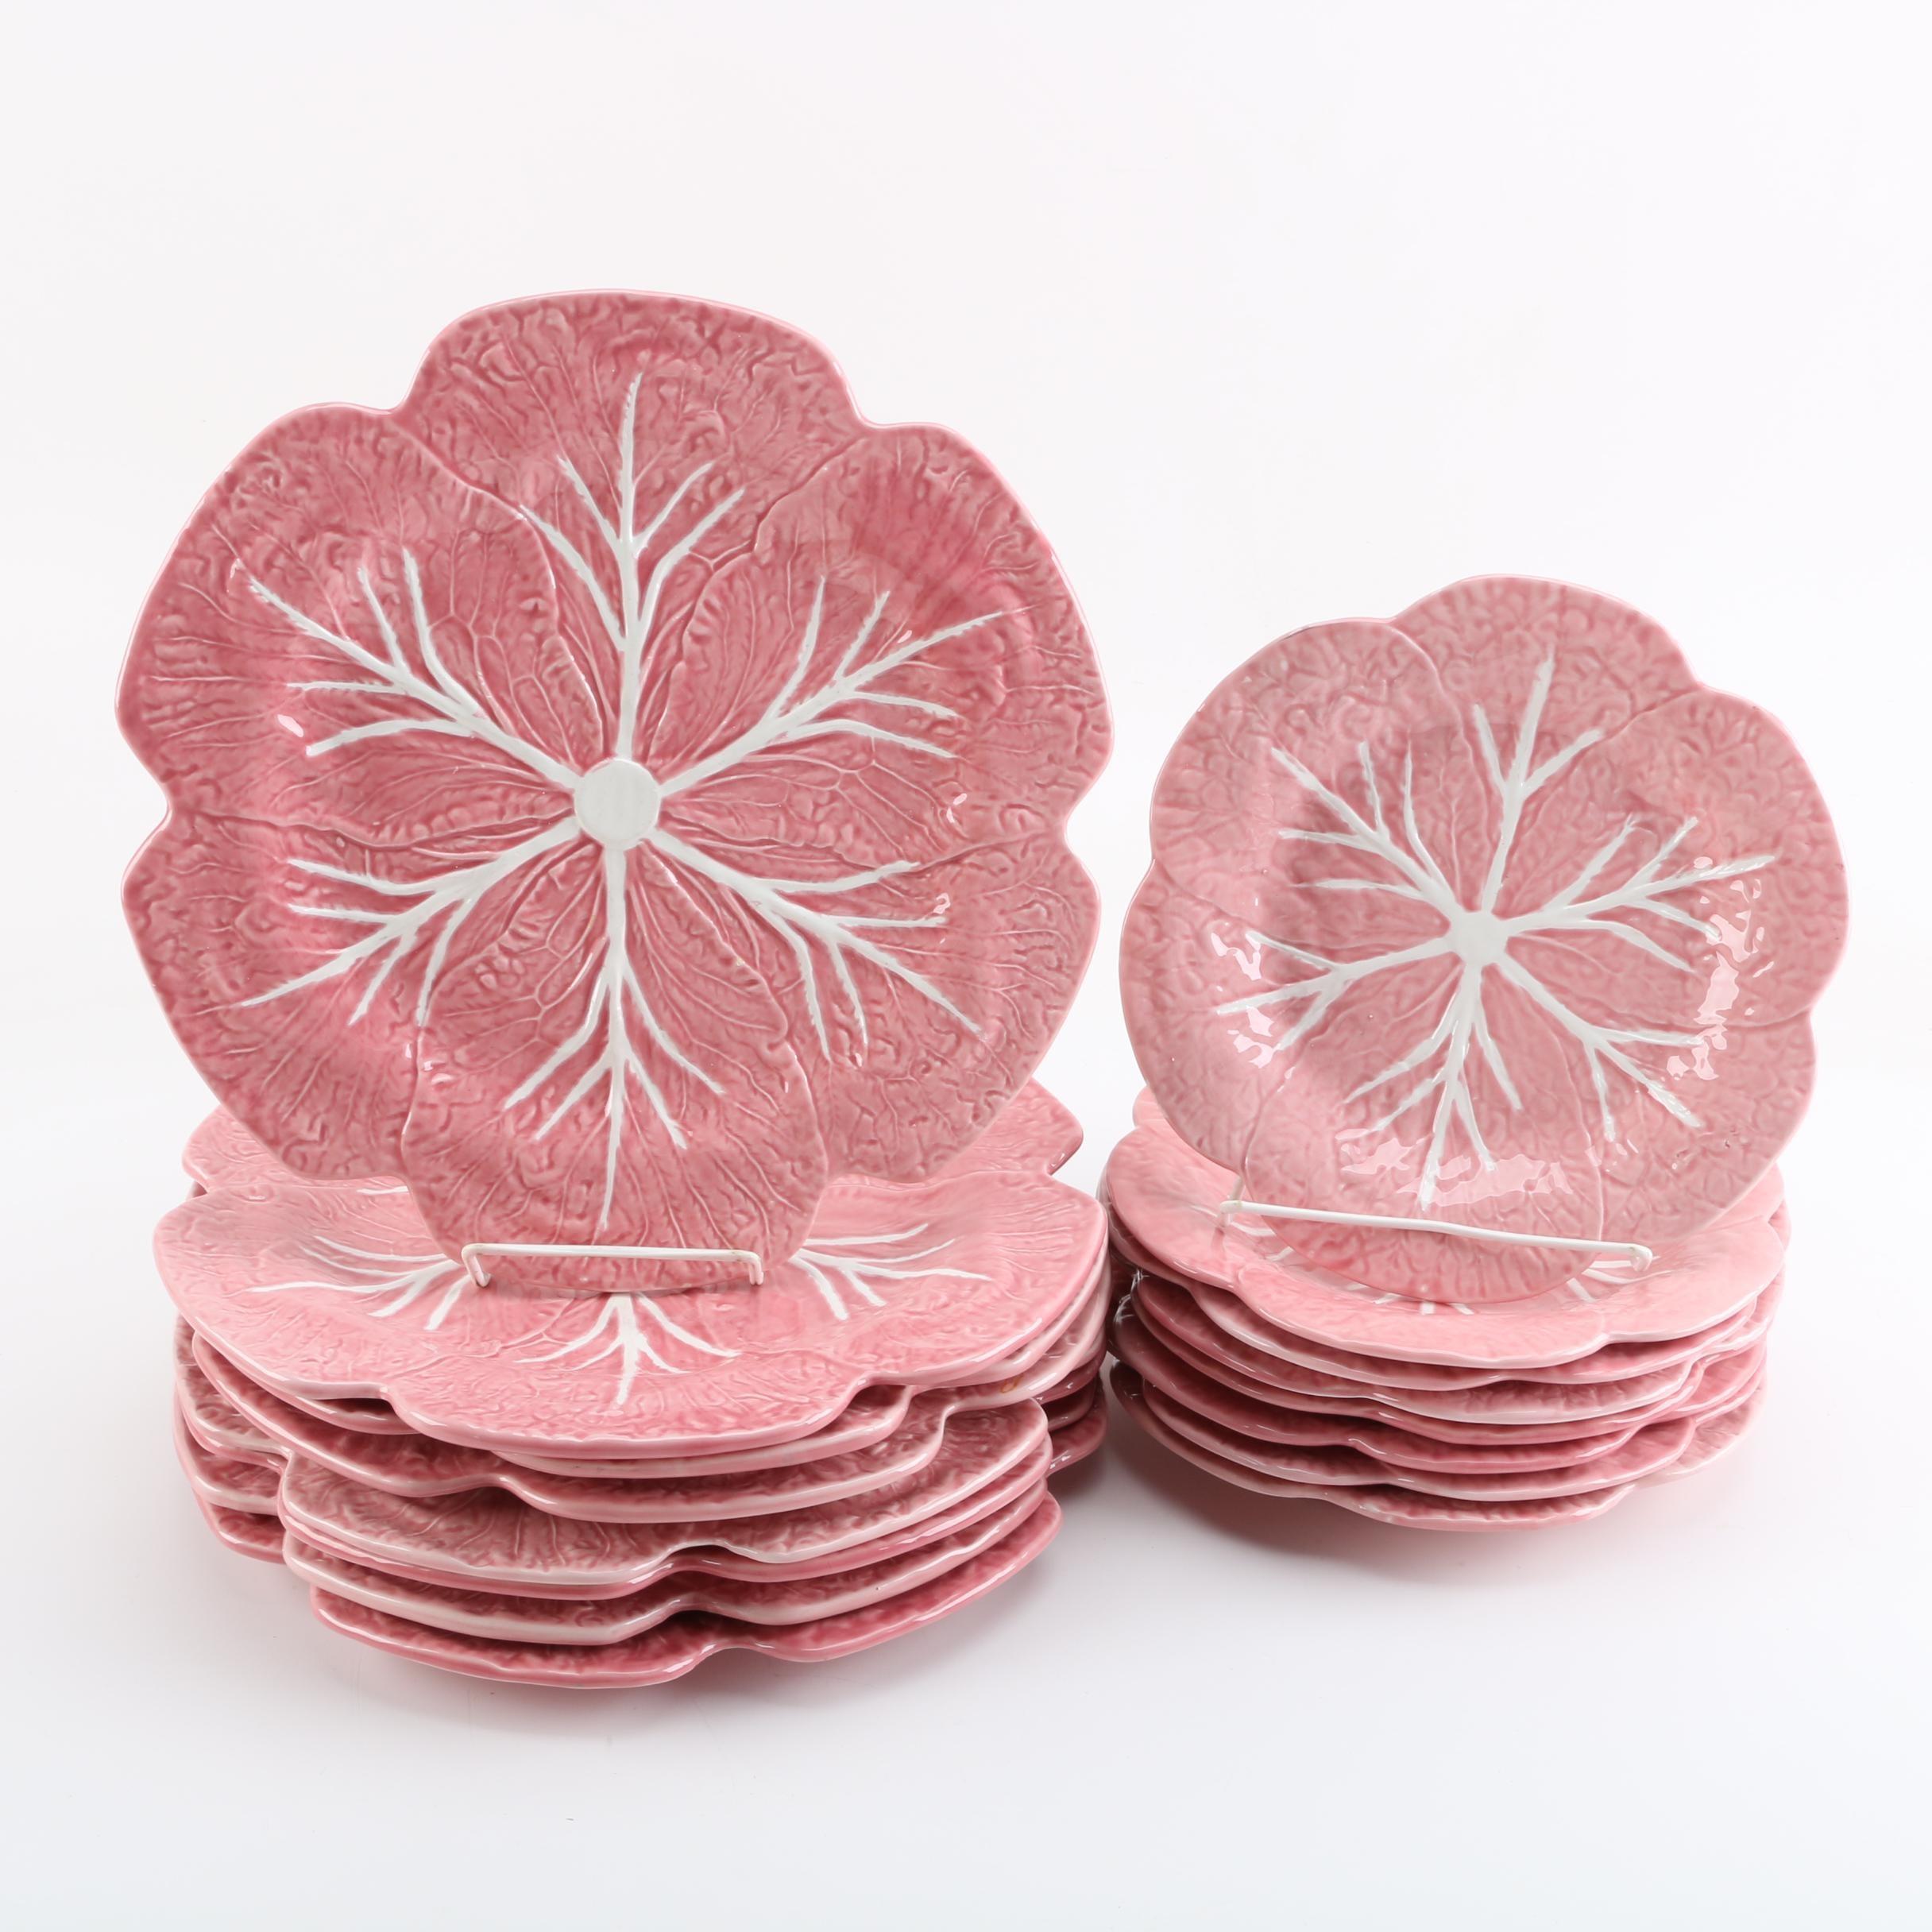 "Bordallo Pinheiro ""Cabbage Pink"" Portuguese Pottery"